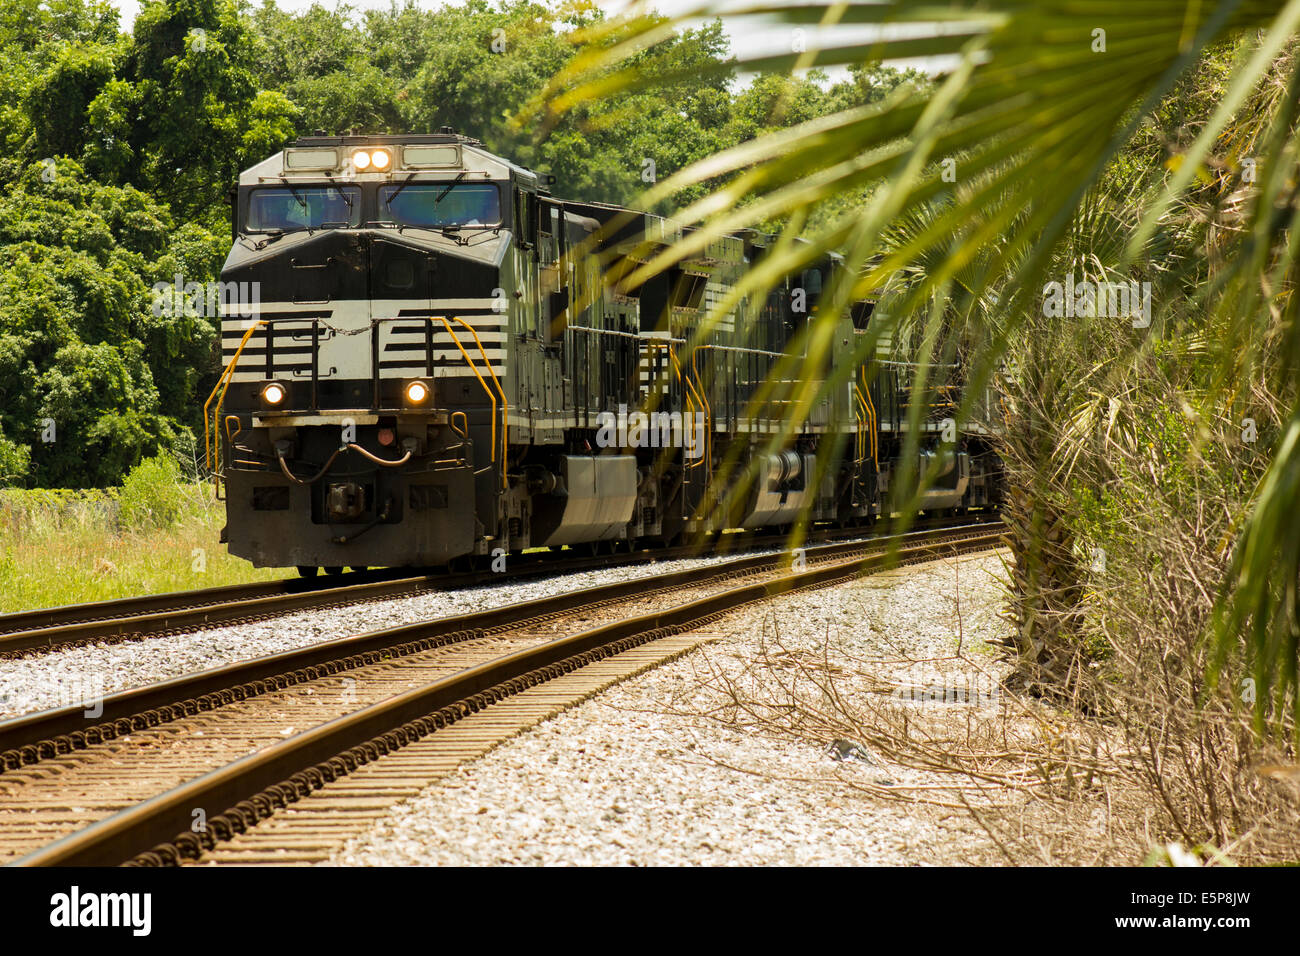 Three locomotives freight train incoming - Stock Image